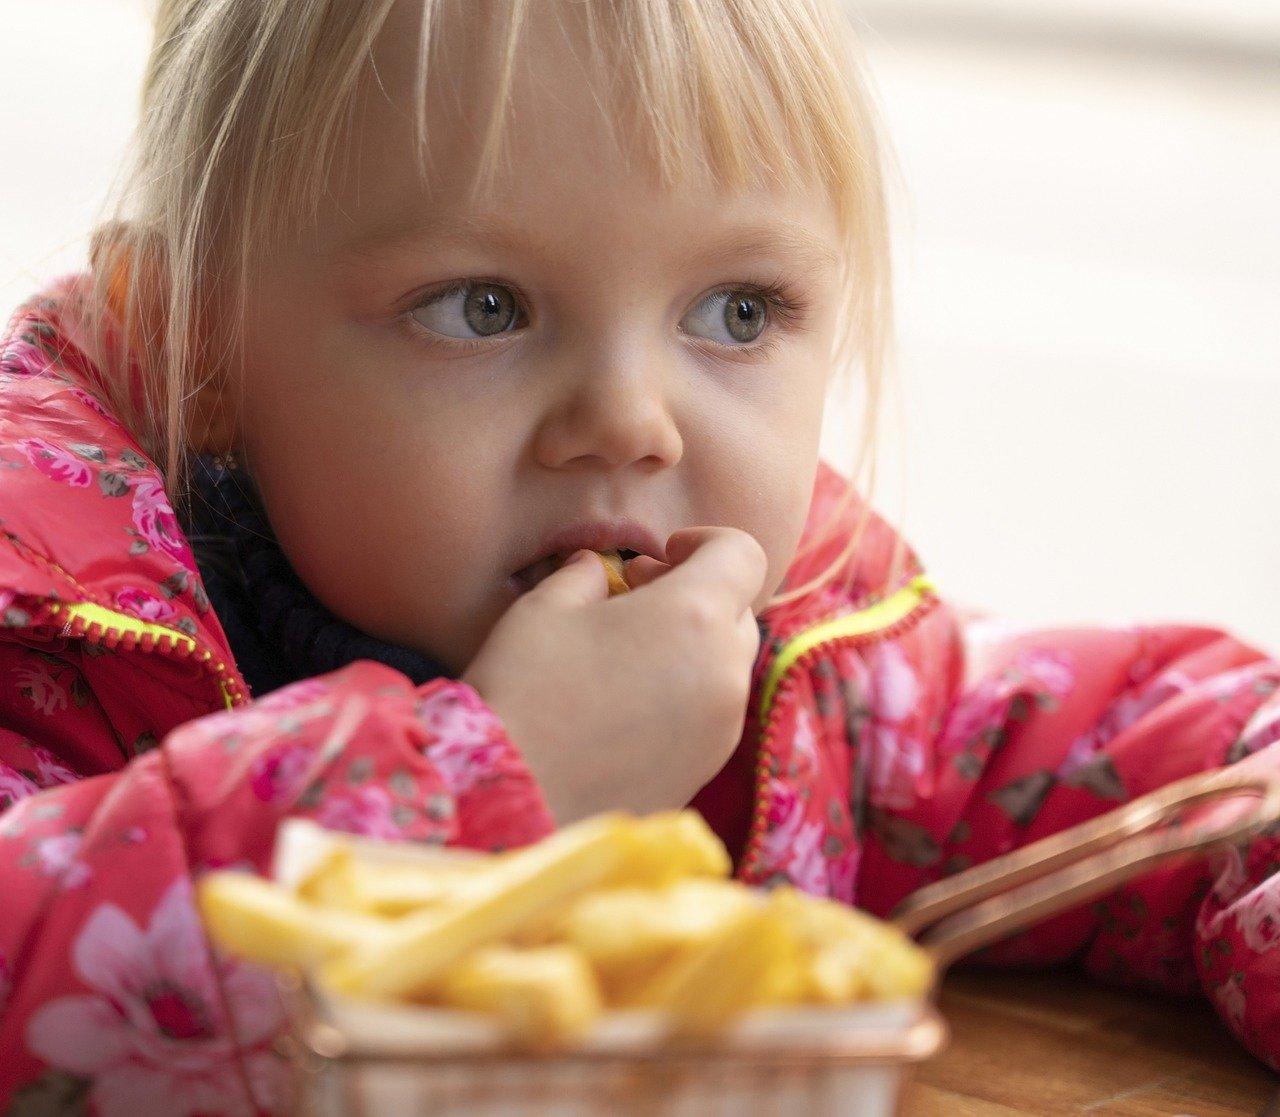 Bambini-e-Celiachia-Cosa-Mangiare Bambini e celiachia: come comportarsi?